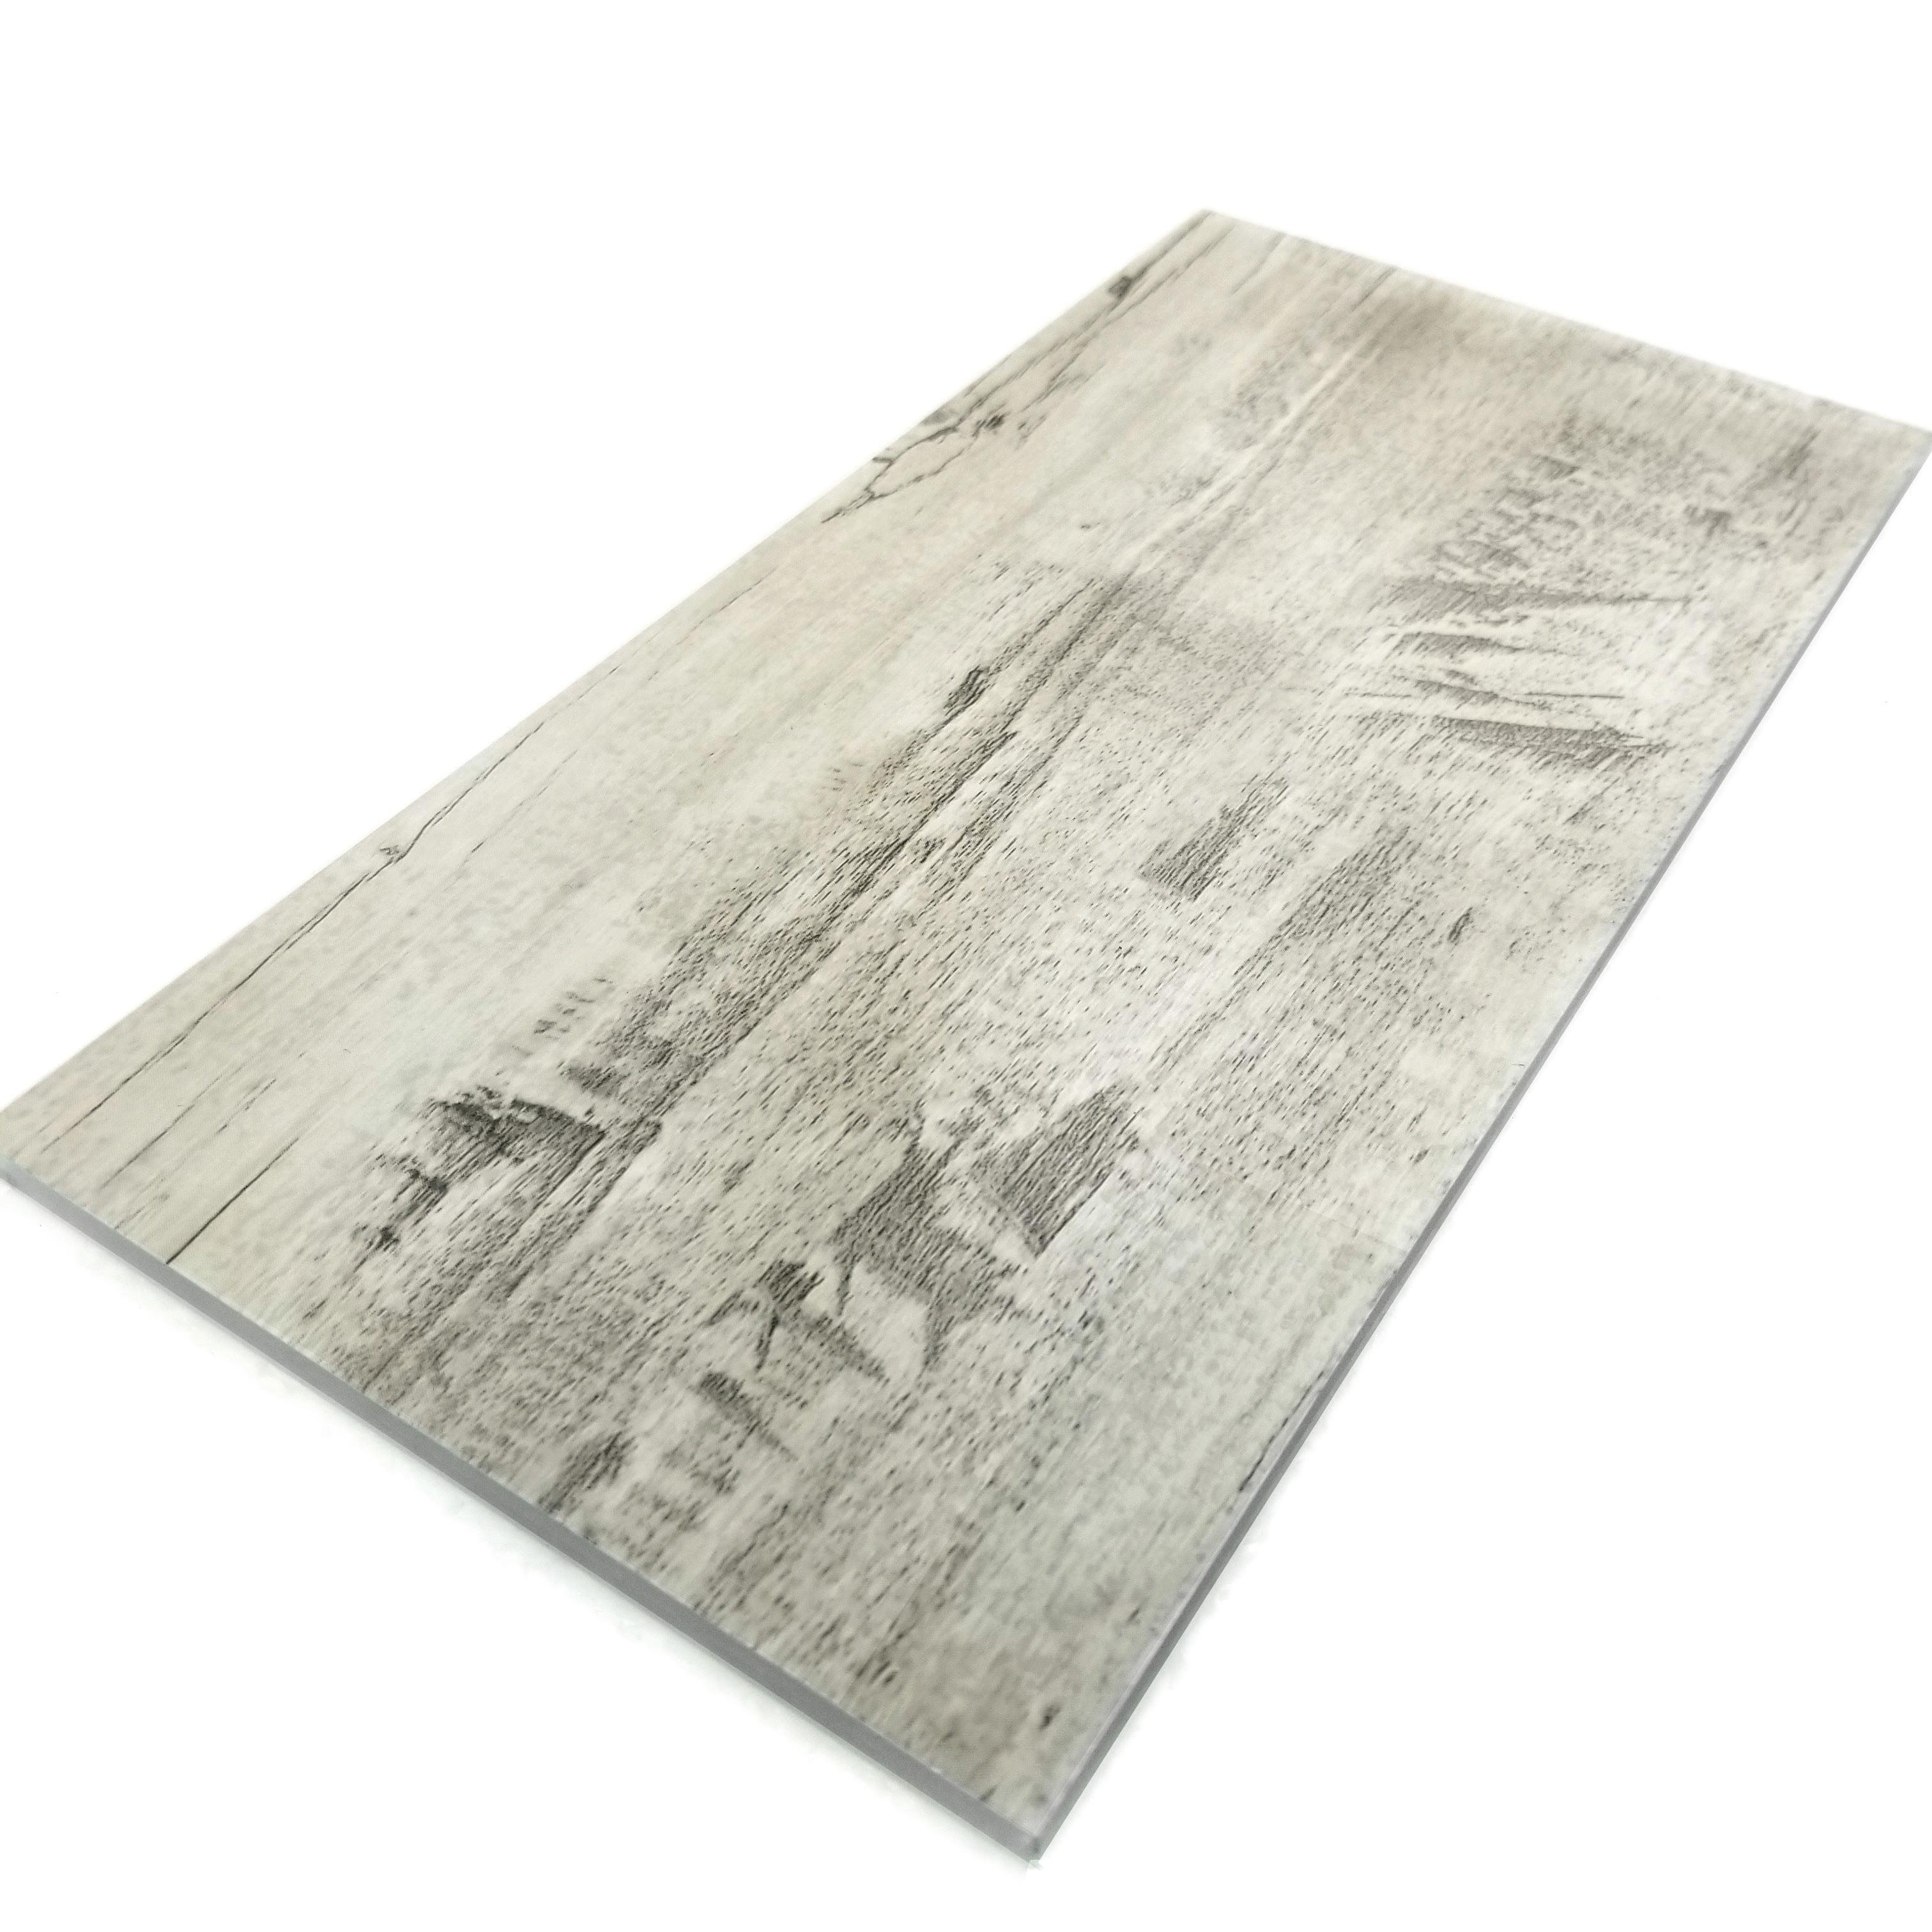 "Abolos- Nature 7"" x 16"" Glass Subway Backsplash Tile in Gray/Tan (9.33sqft / 12pc Box)"